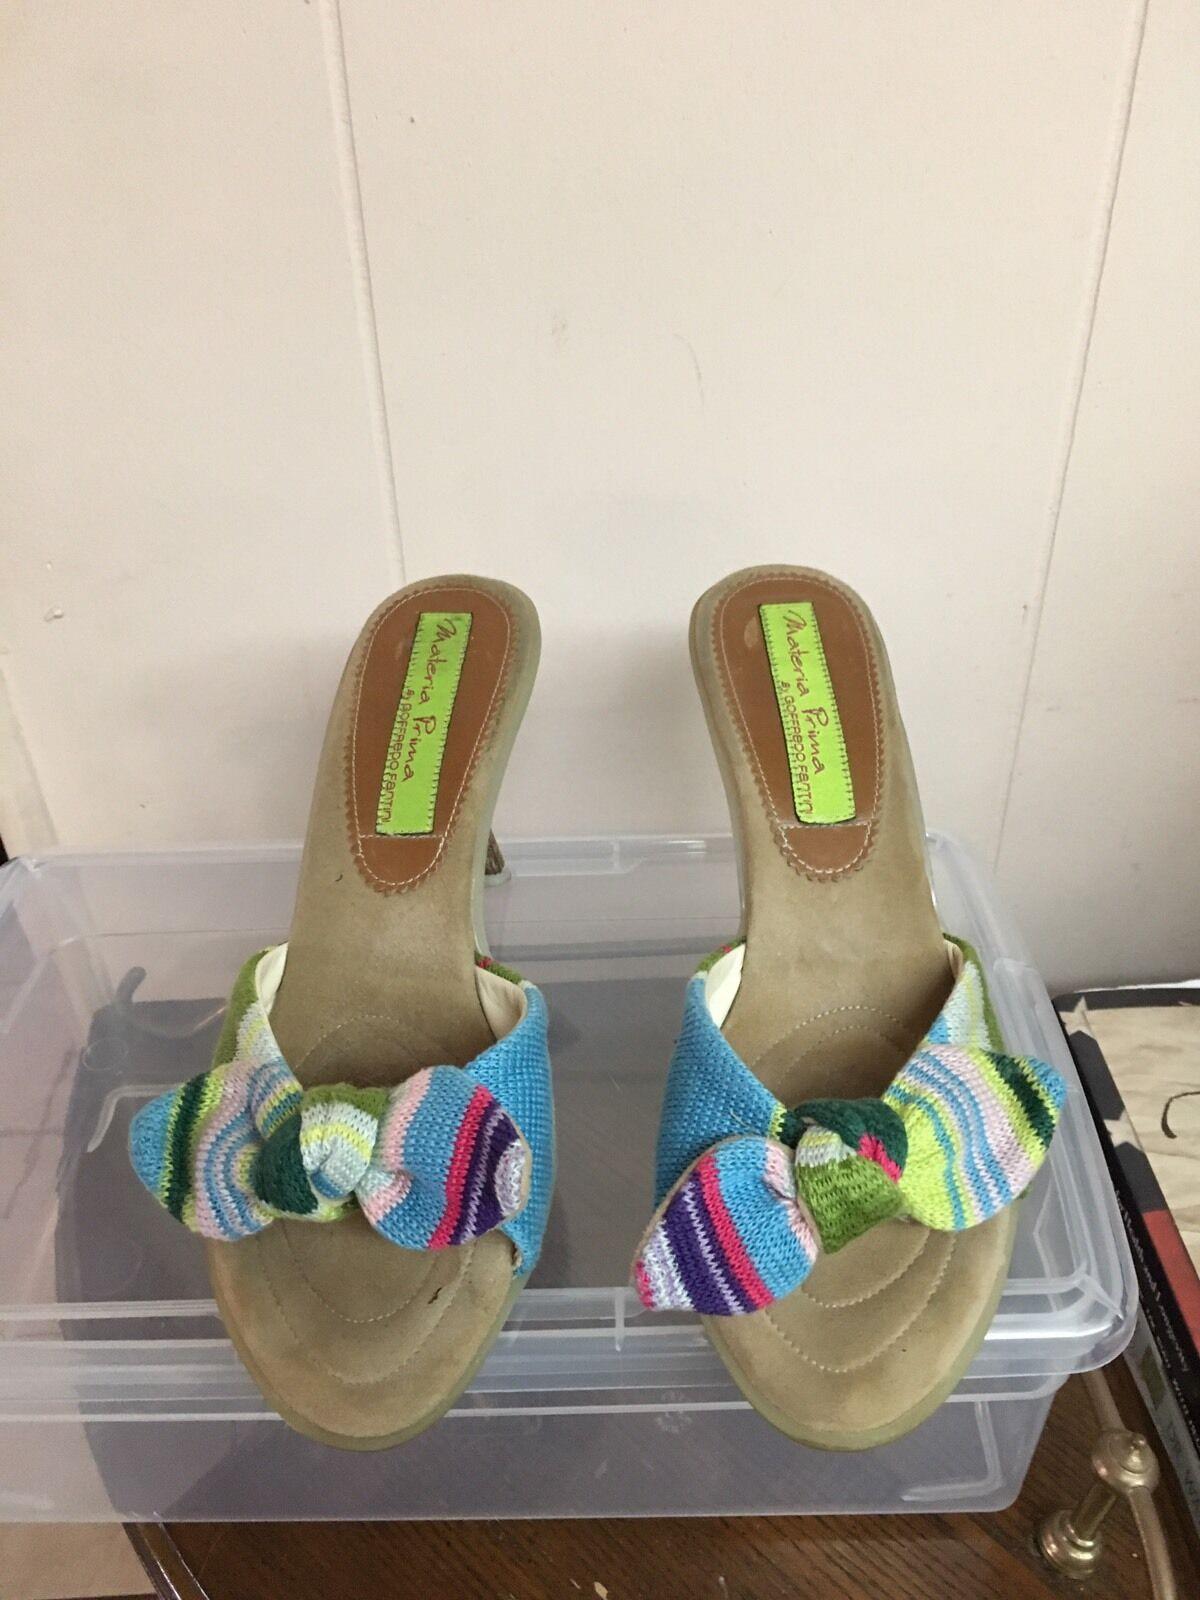 Materia Prima Sandals by Goffredo Fantini Tan Canvas Mule Sandals Prima Size 37.5 7.5 d3c8c4